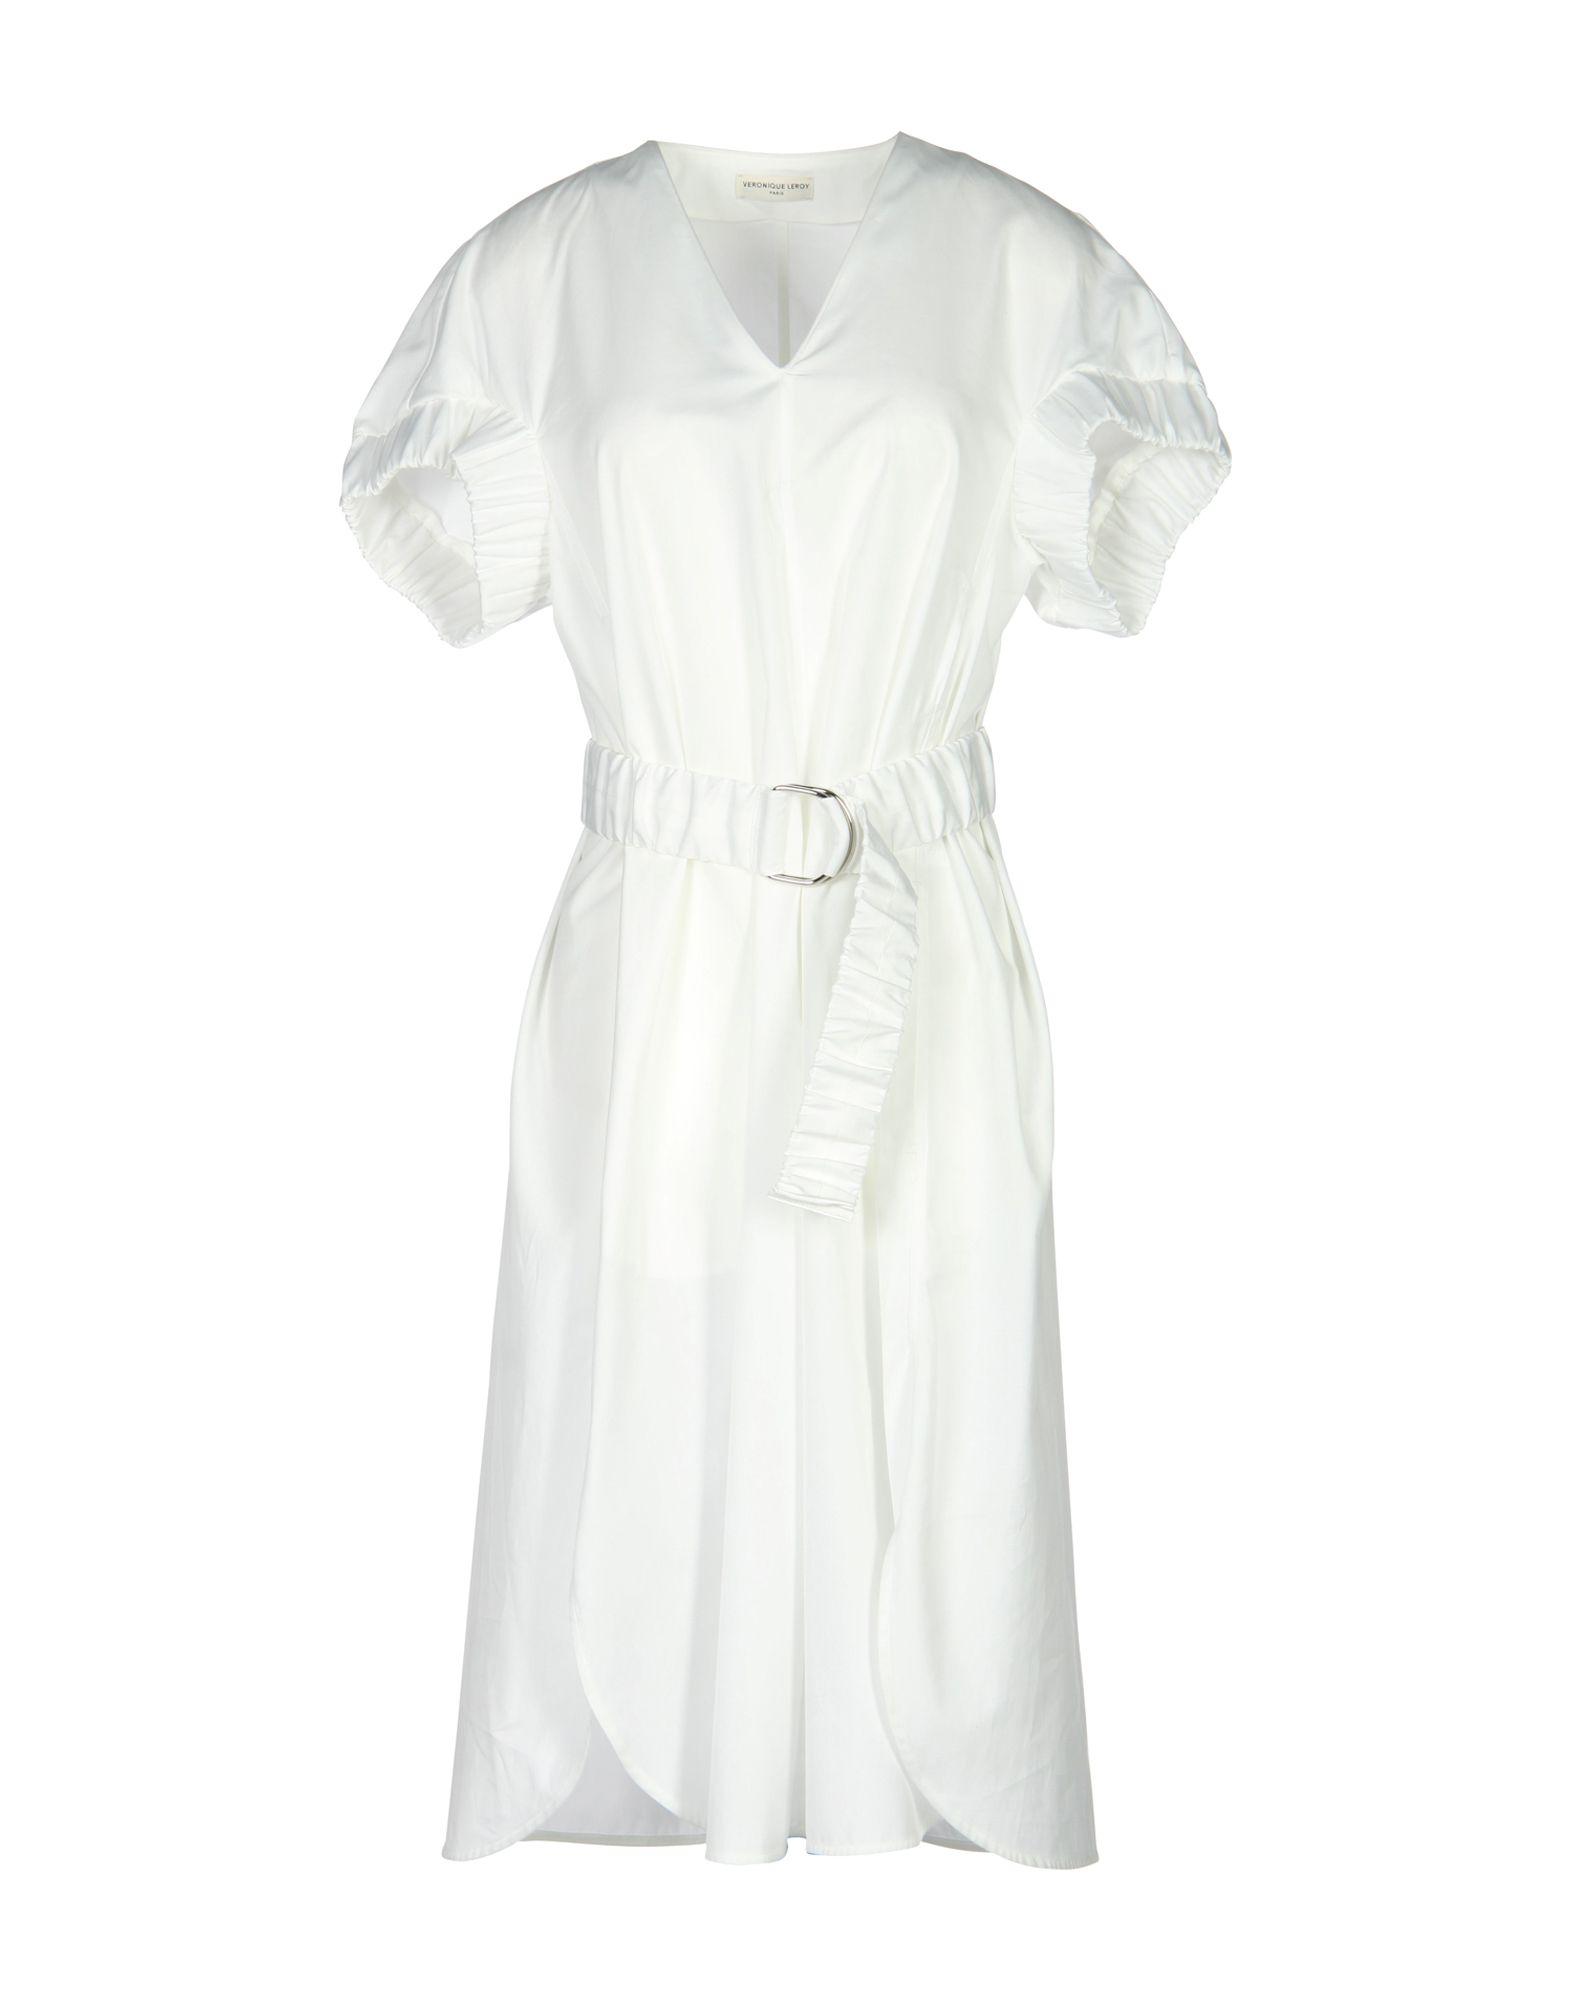 VERONIQUE LEROY Knee-Length Dresses in White